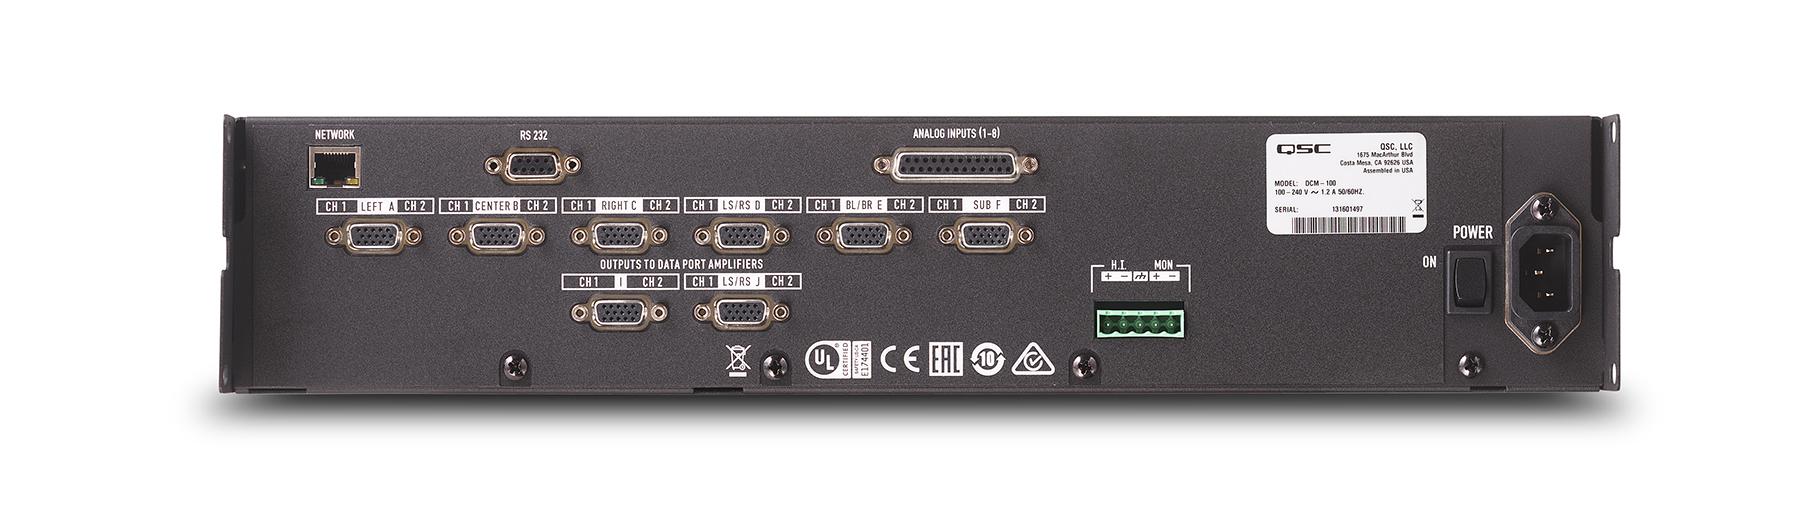 d6935ba15e5 DCM 100 - DCM Series - QSC Processors - Processing - Products - Cinema - QSC